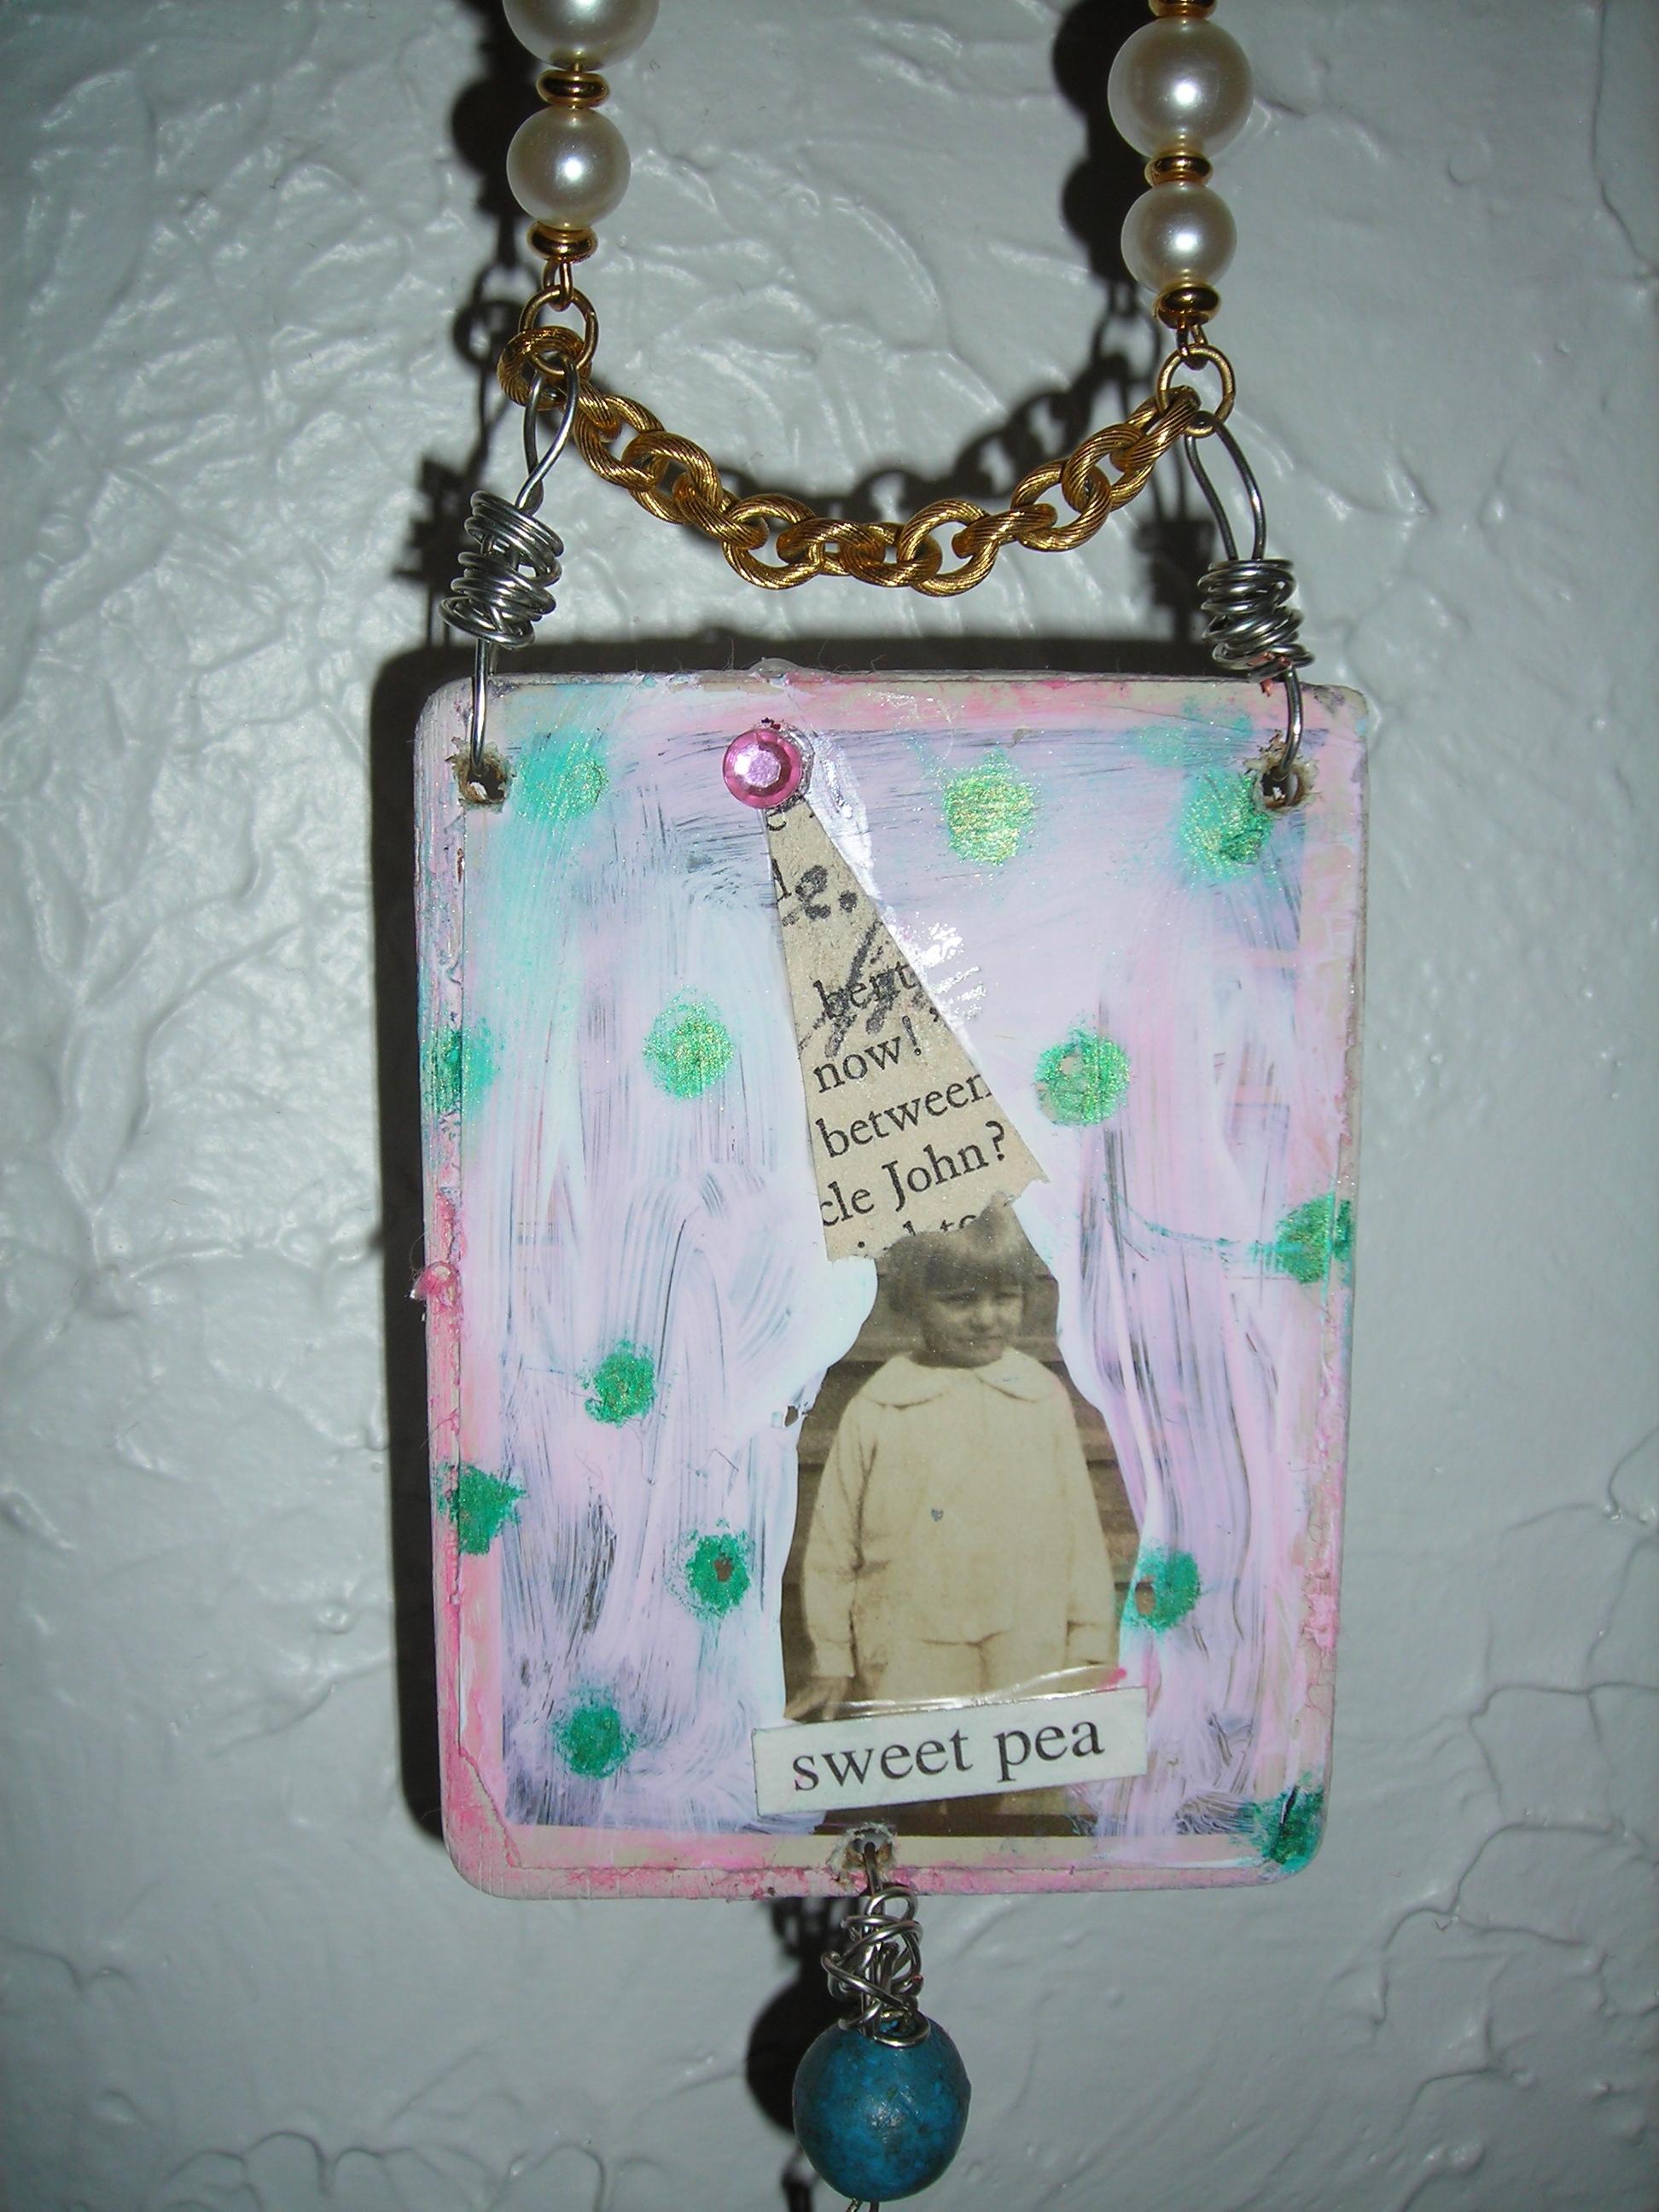 Darling little 'sweet pea' ... Sue's magic